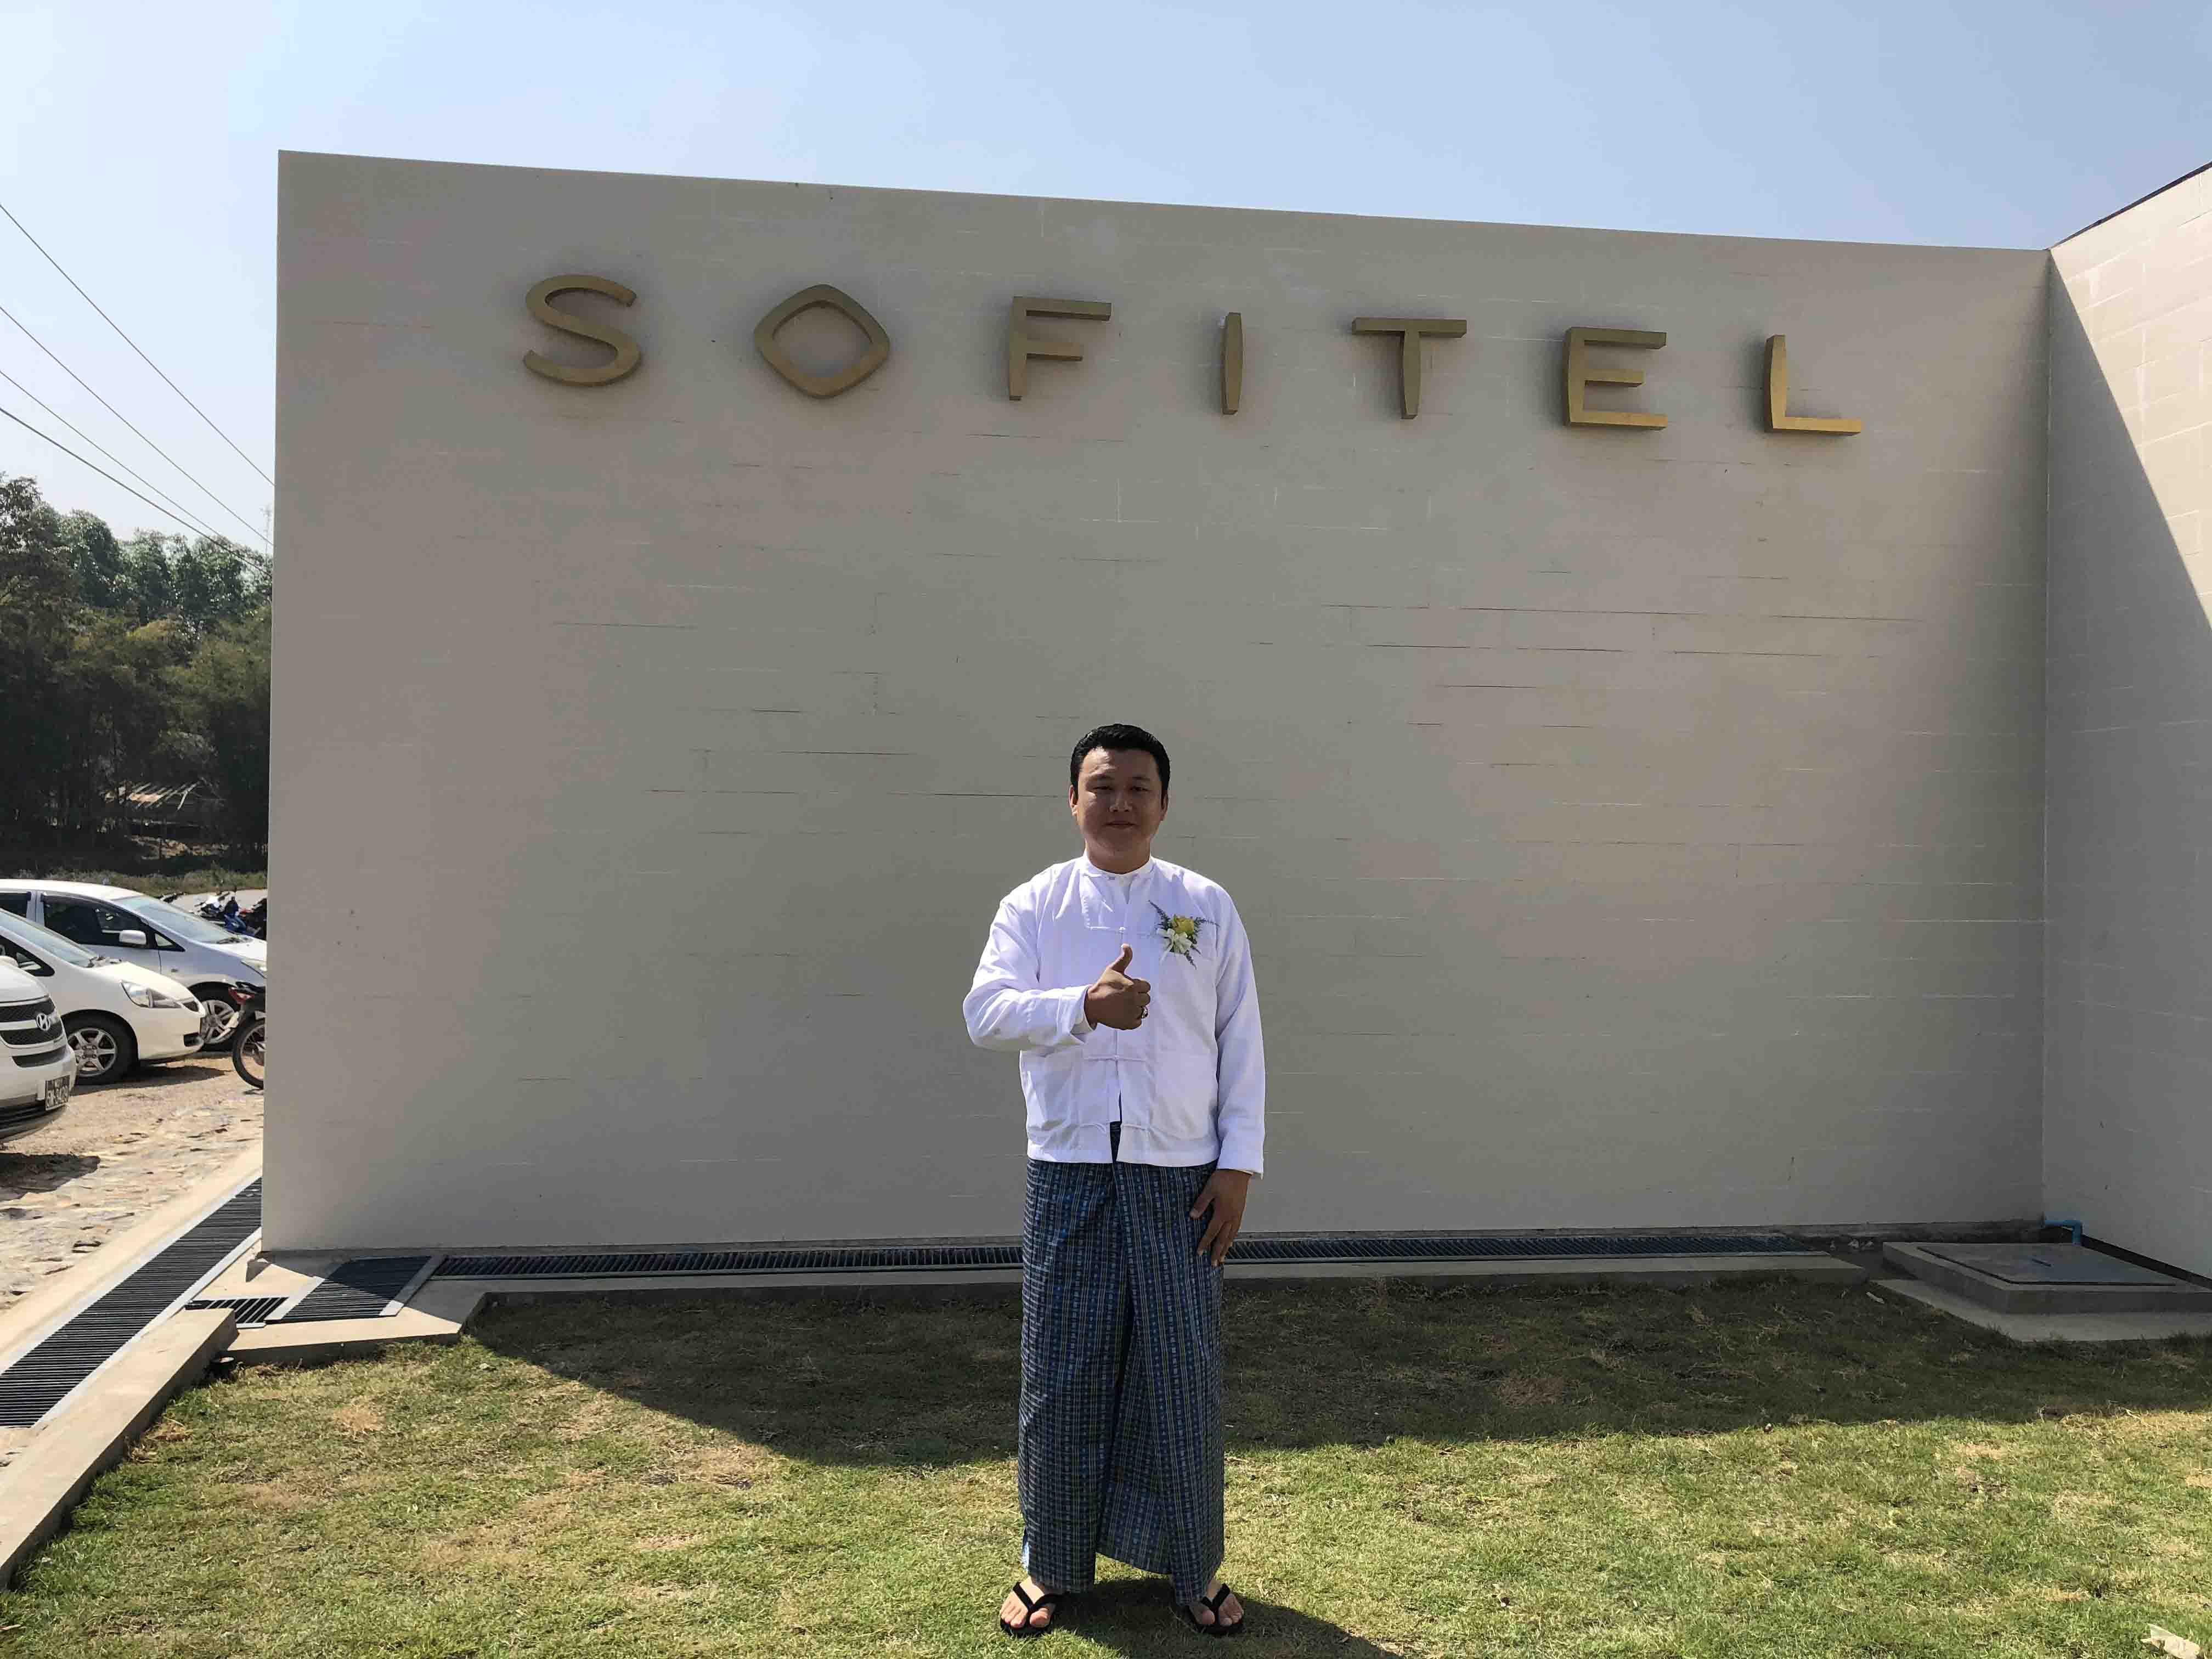 Bellissimo-Sofitel Inle Lake Myat Min Hotel-myanmar | Project Case